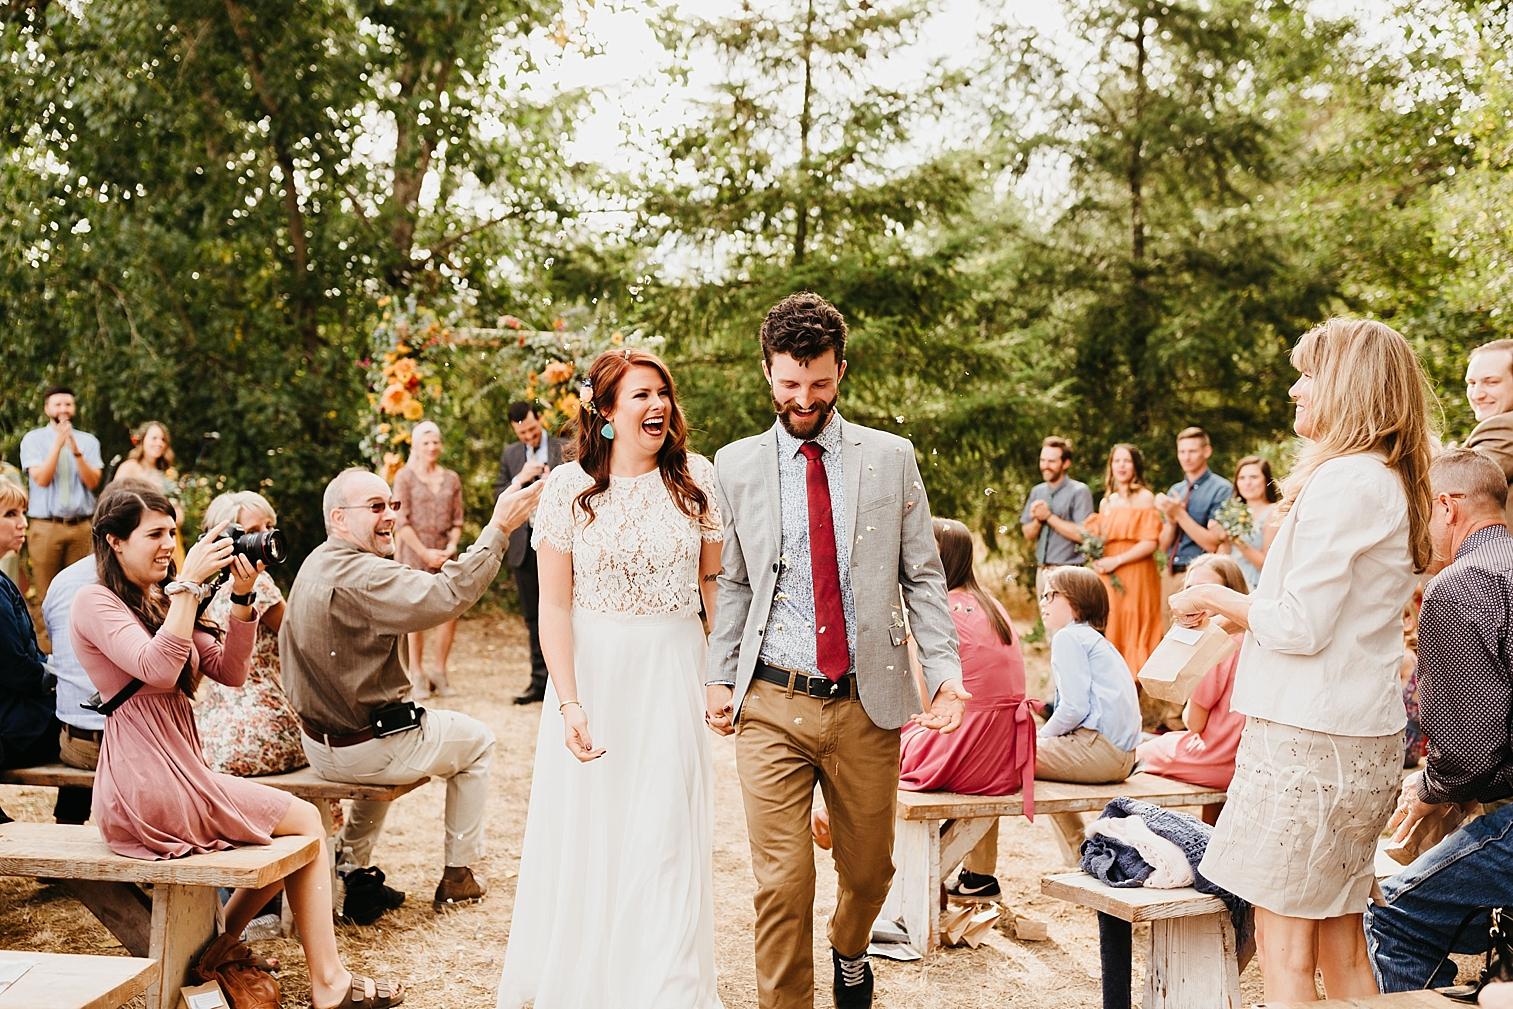 Summer-Camp-Themed-Wedding-104.jpg